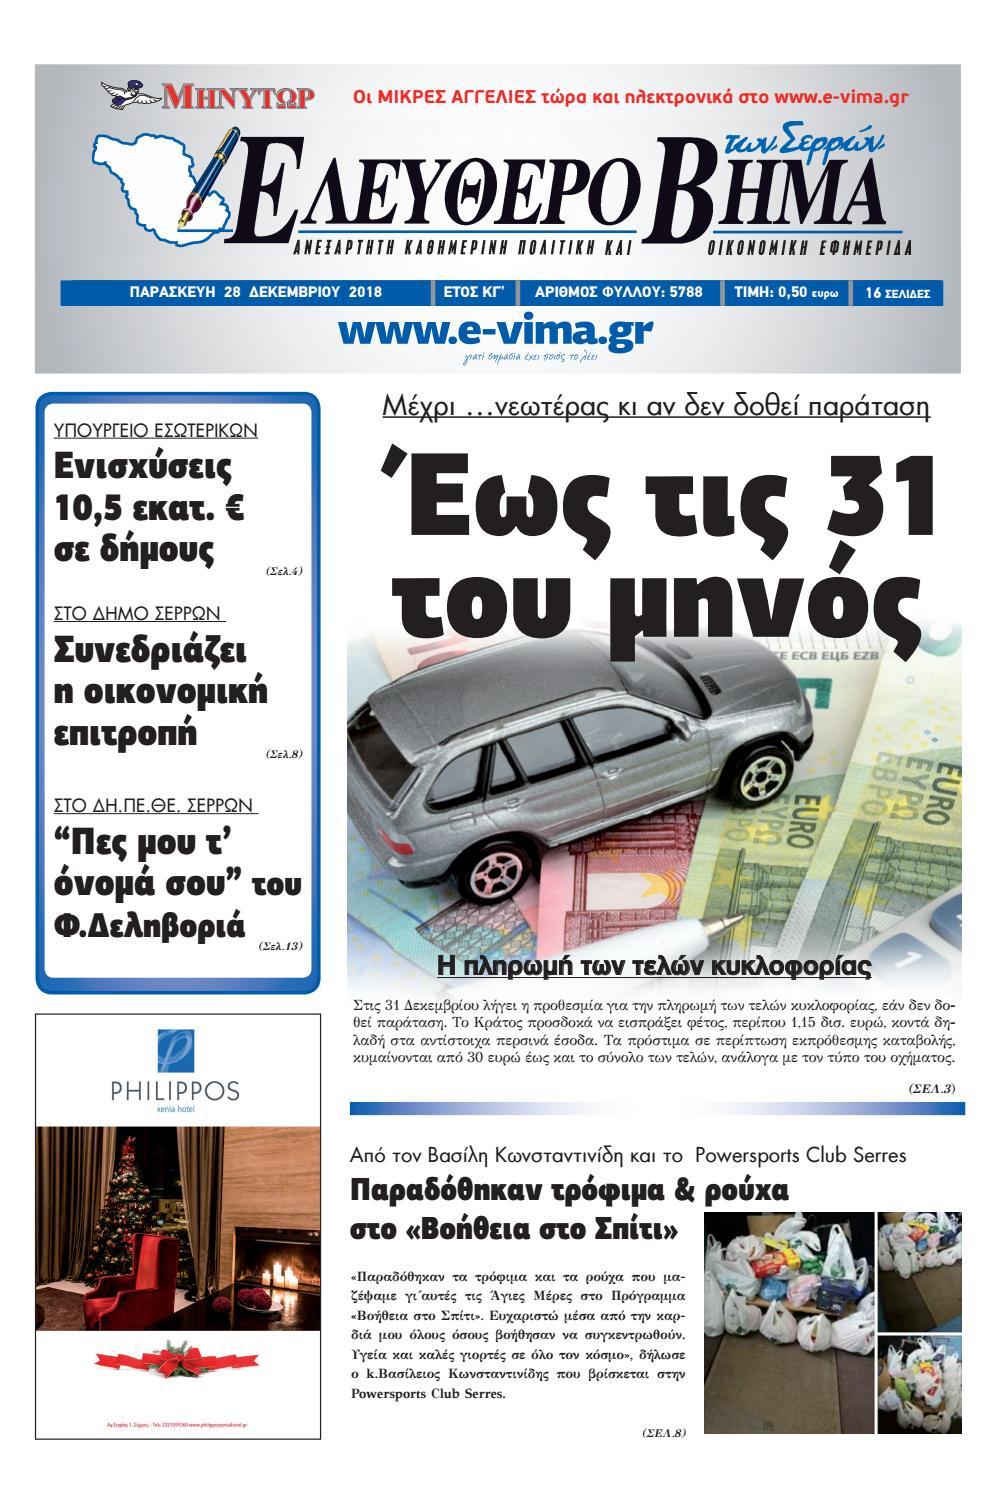 8b4301a04 Ελεύθερο Βήμα των Σερρών 22 Δεκεμβρίου 2018 by Εφημερίδα Ελεύθερο Βήμα των  Σερρών - www.e-vima.gr - issuu